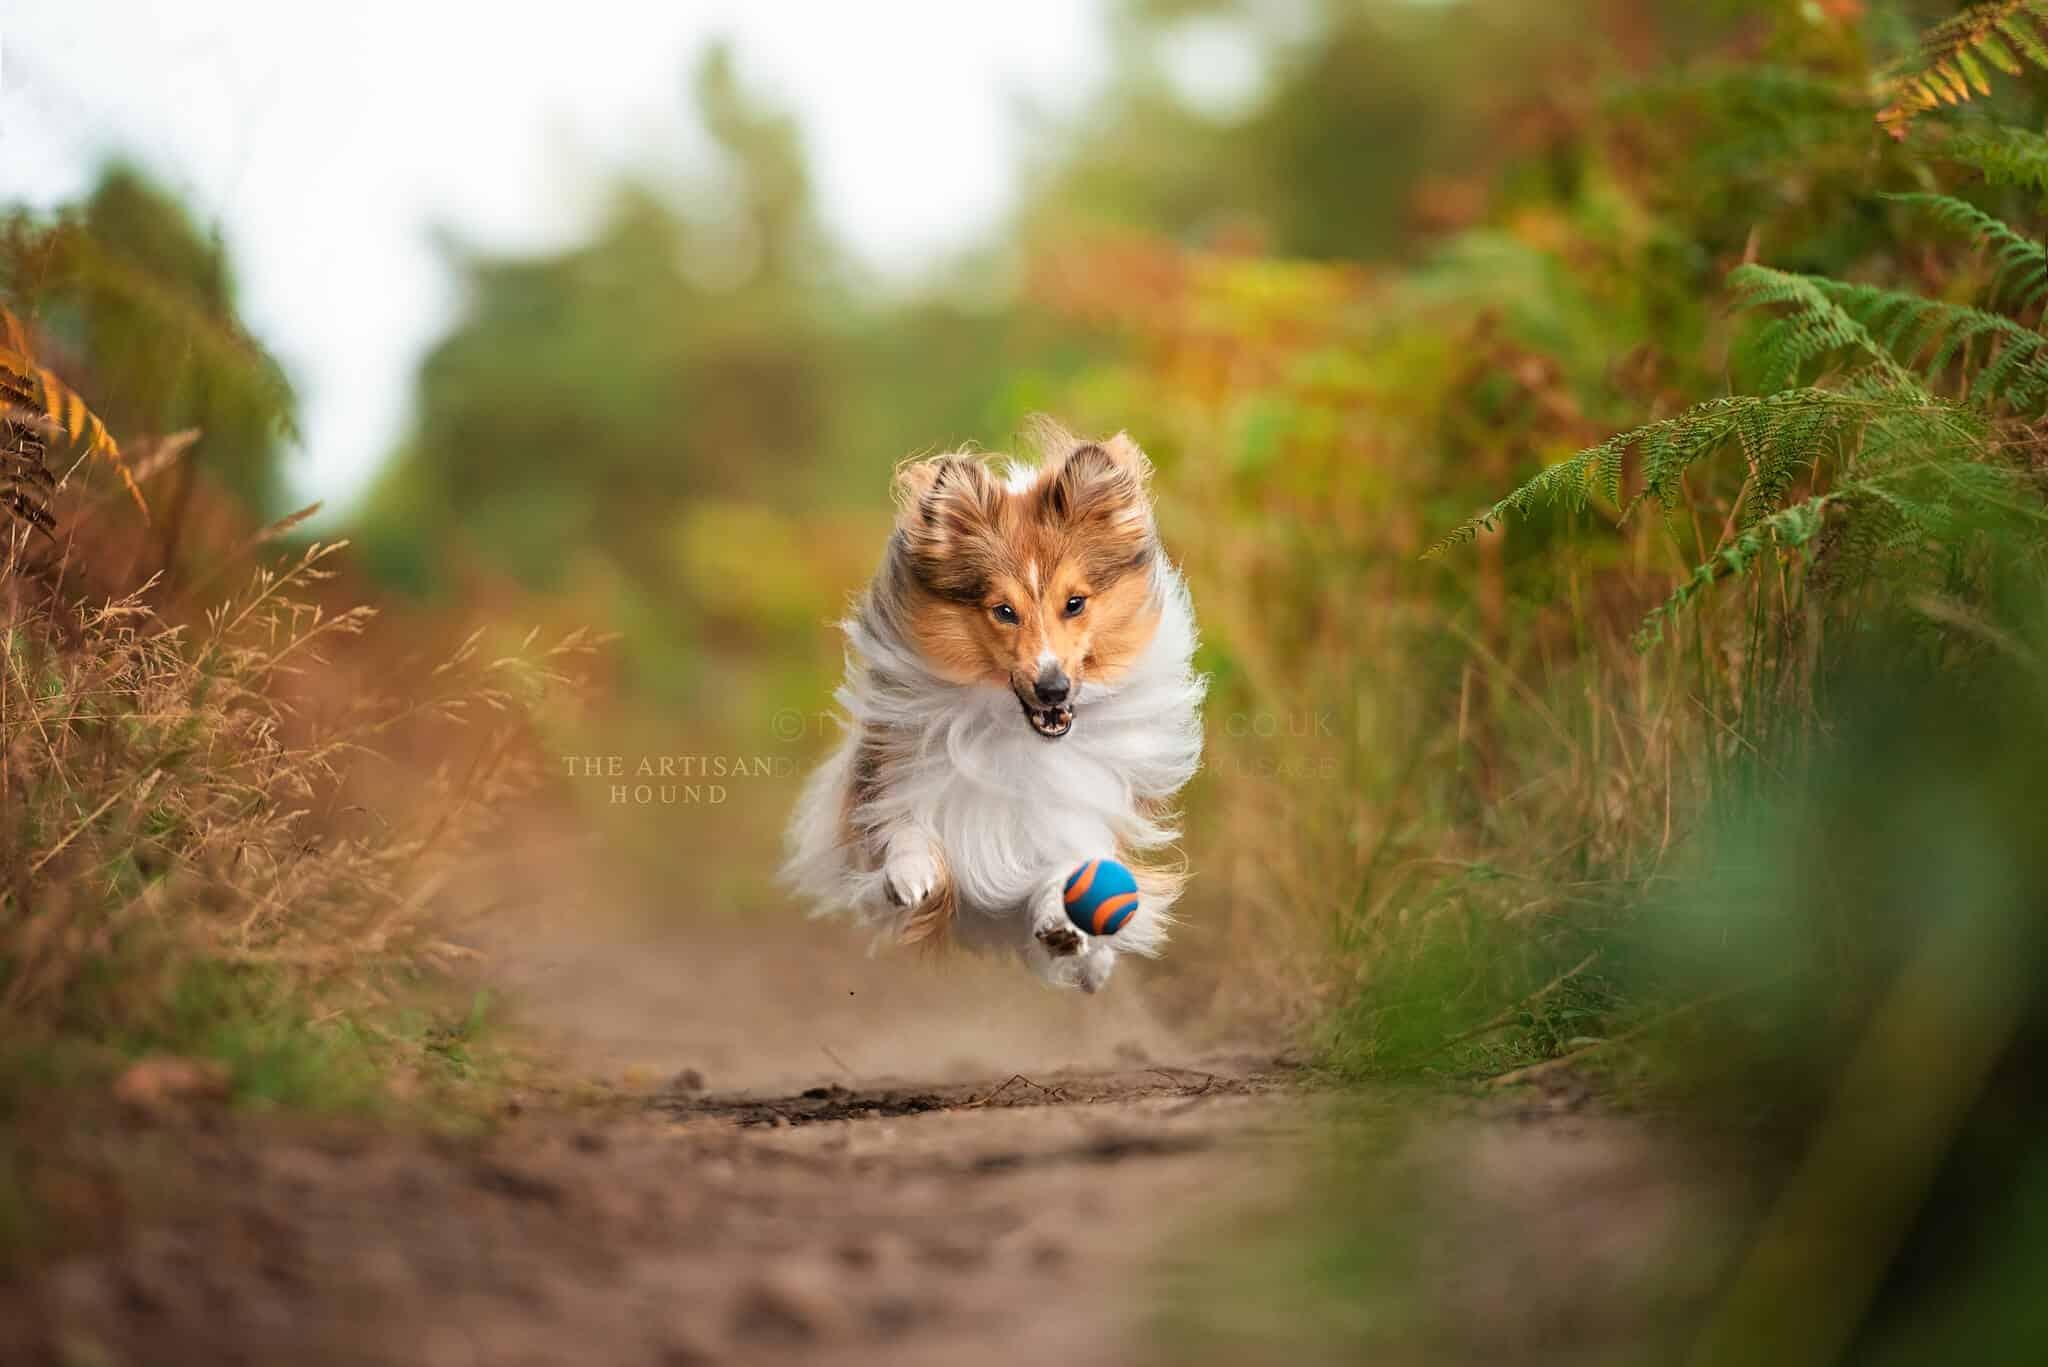 Shetland Sheepdog chasing ball through woods